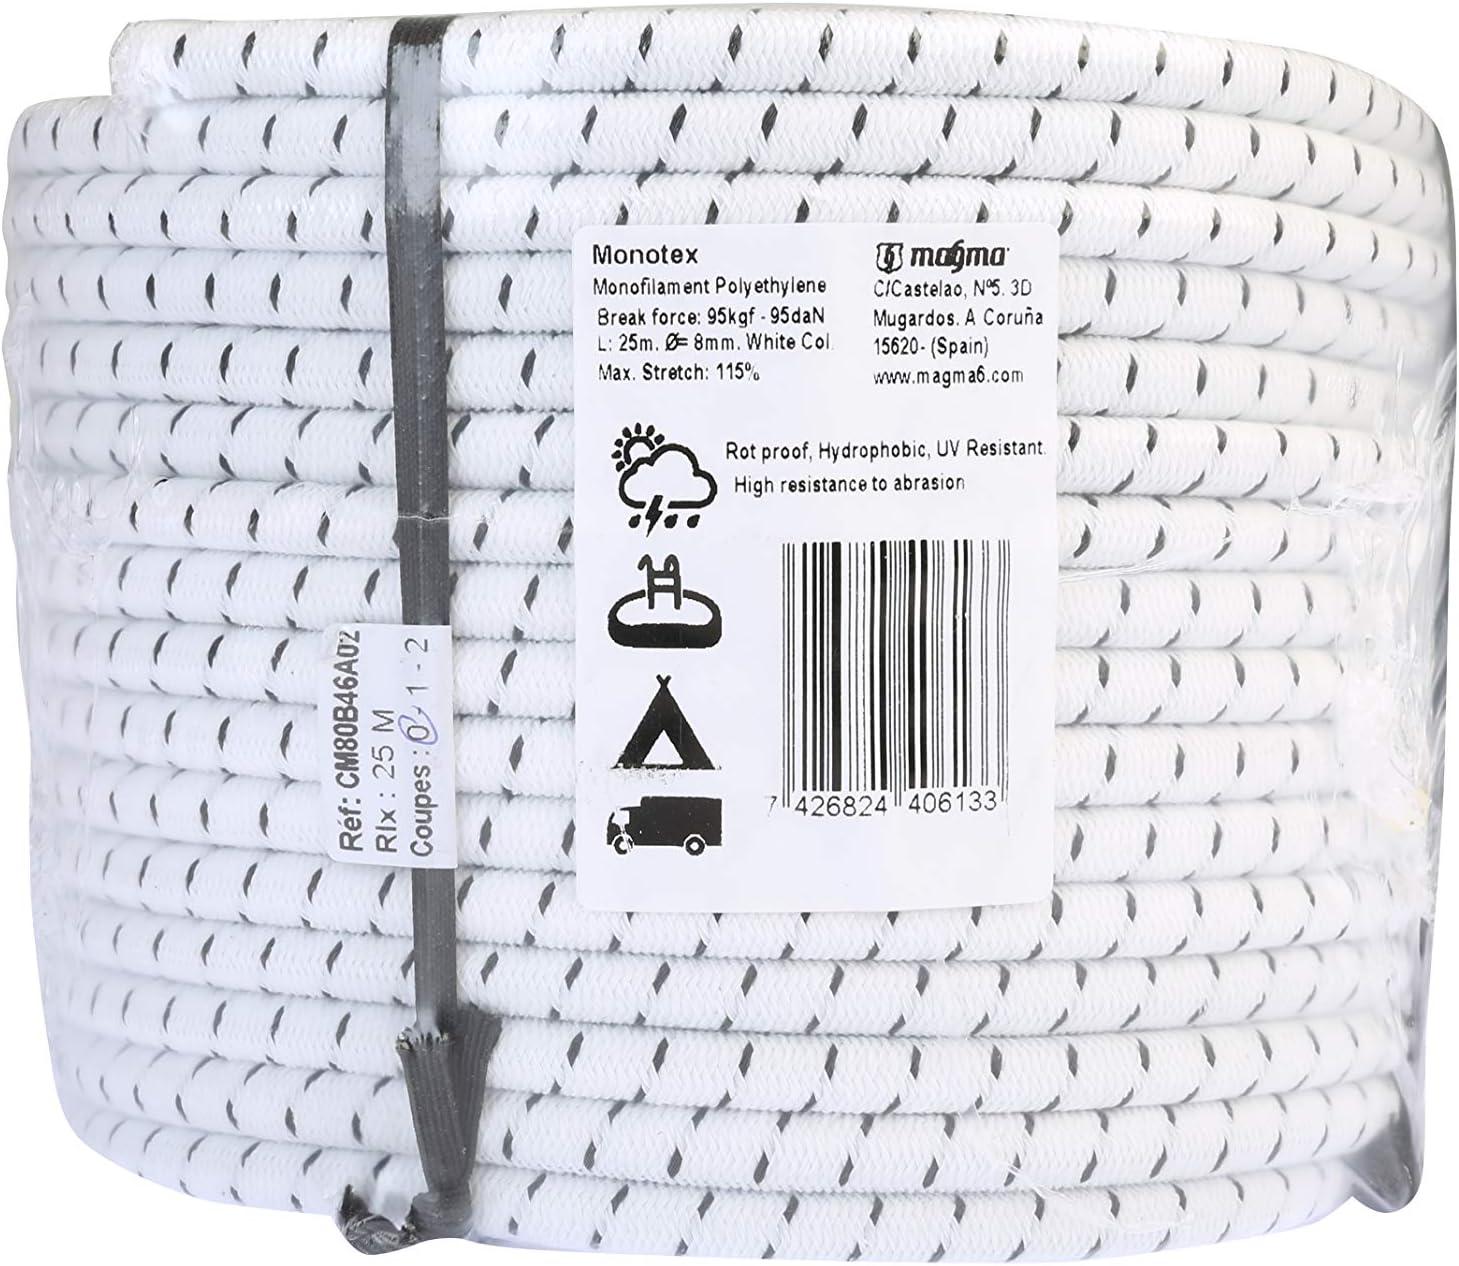 MAGMA Cuerda Elastica 8mm. Monotex Polietileno. Piscinas (Standard NF P 90-308) Toldos Acampadas Exteriores Manualidades Nautica Amarres Escalada ...